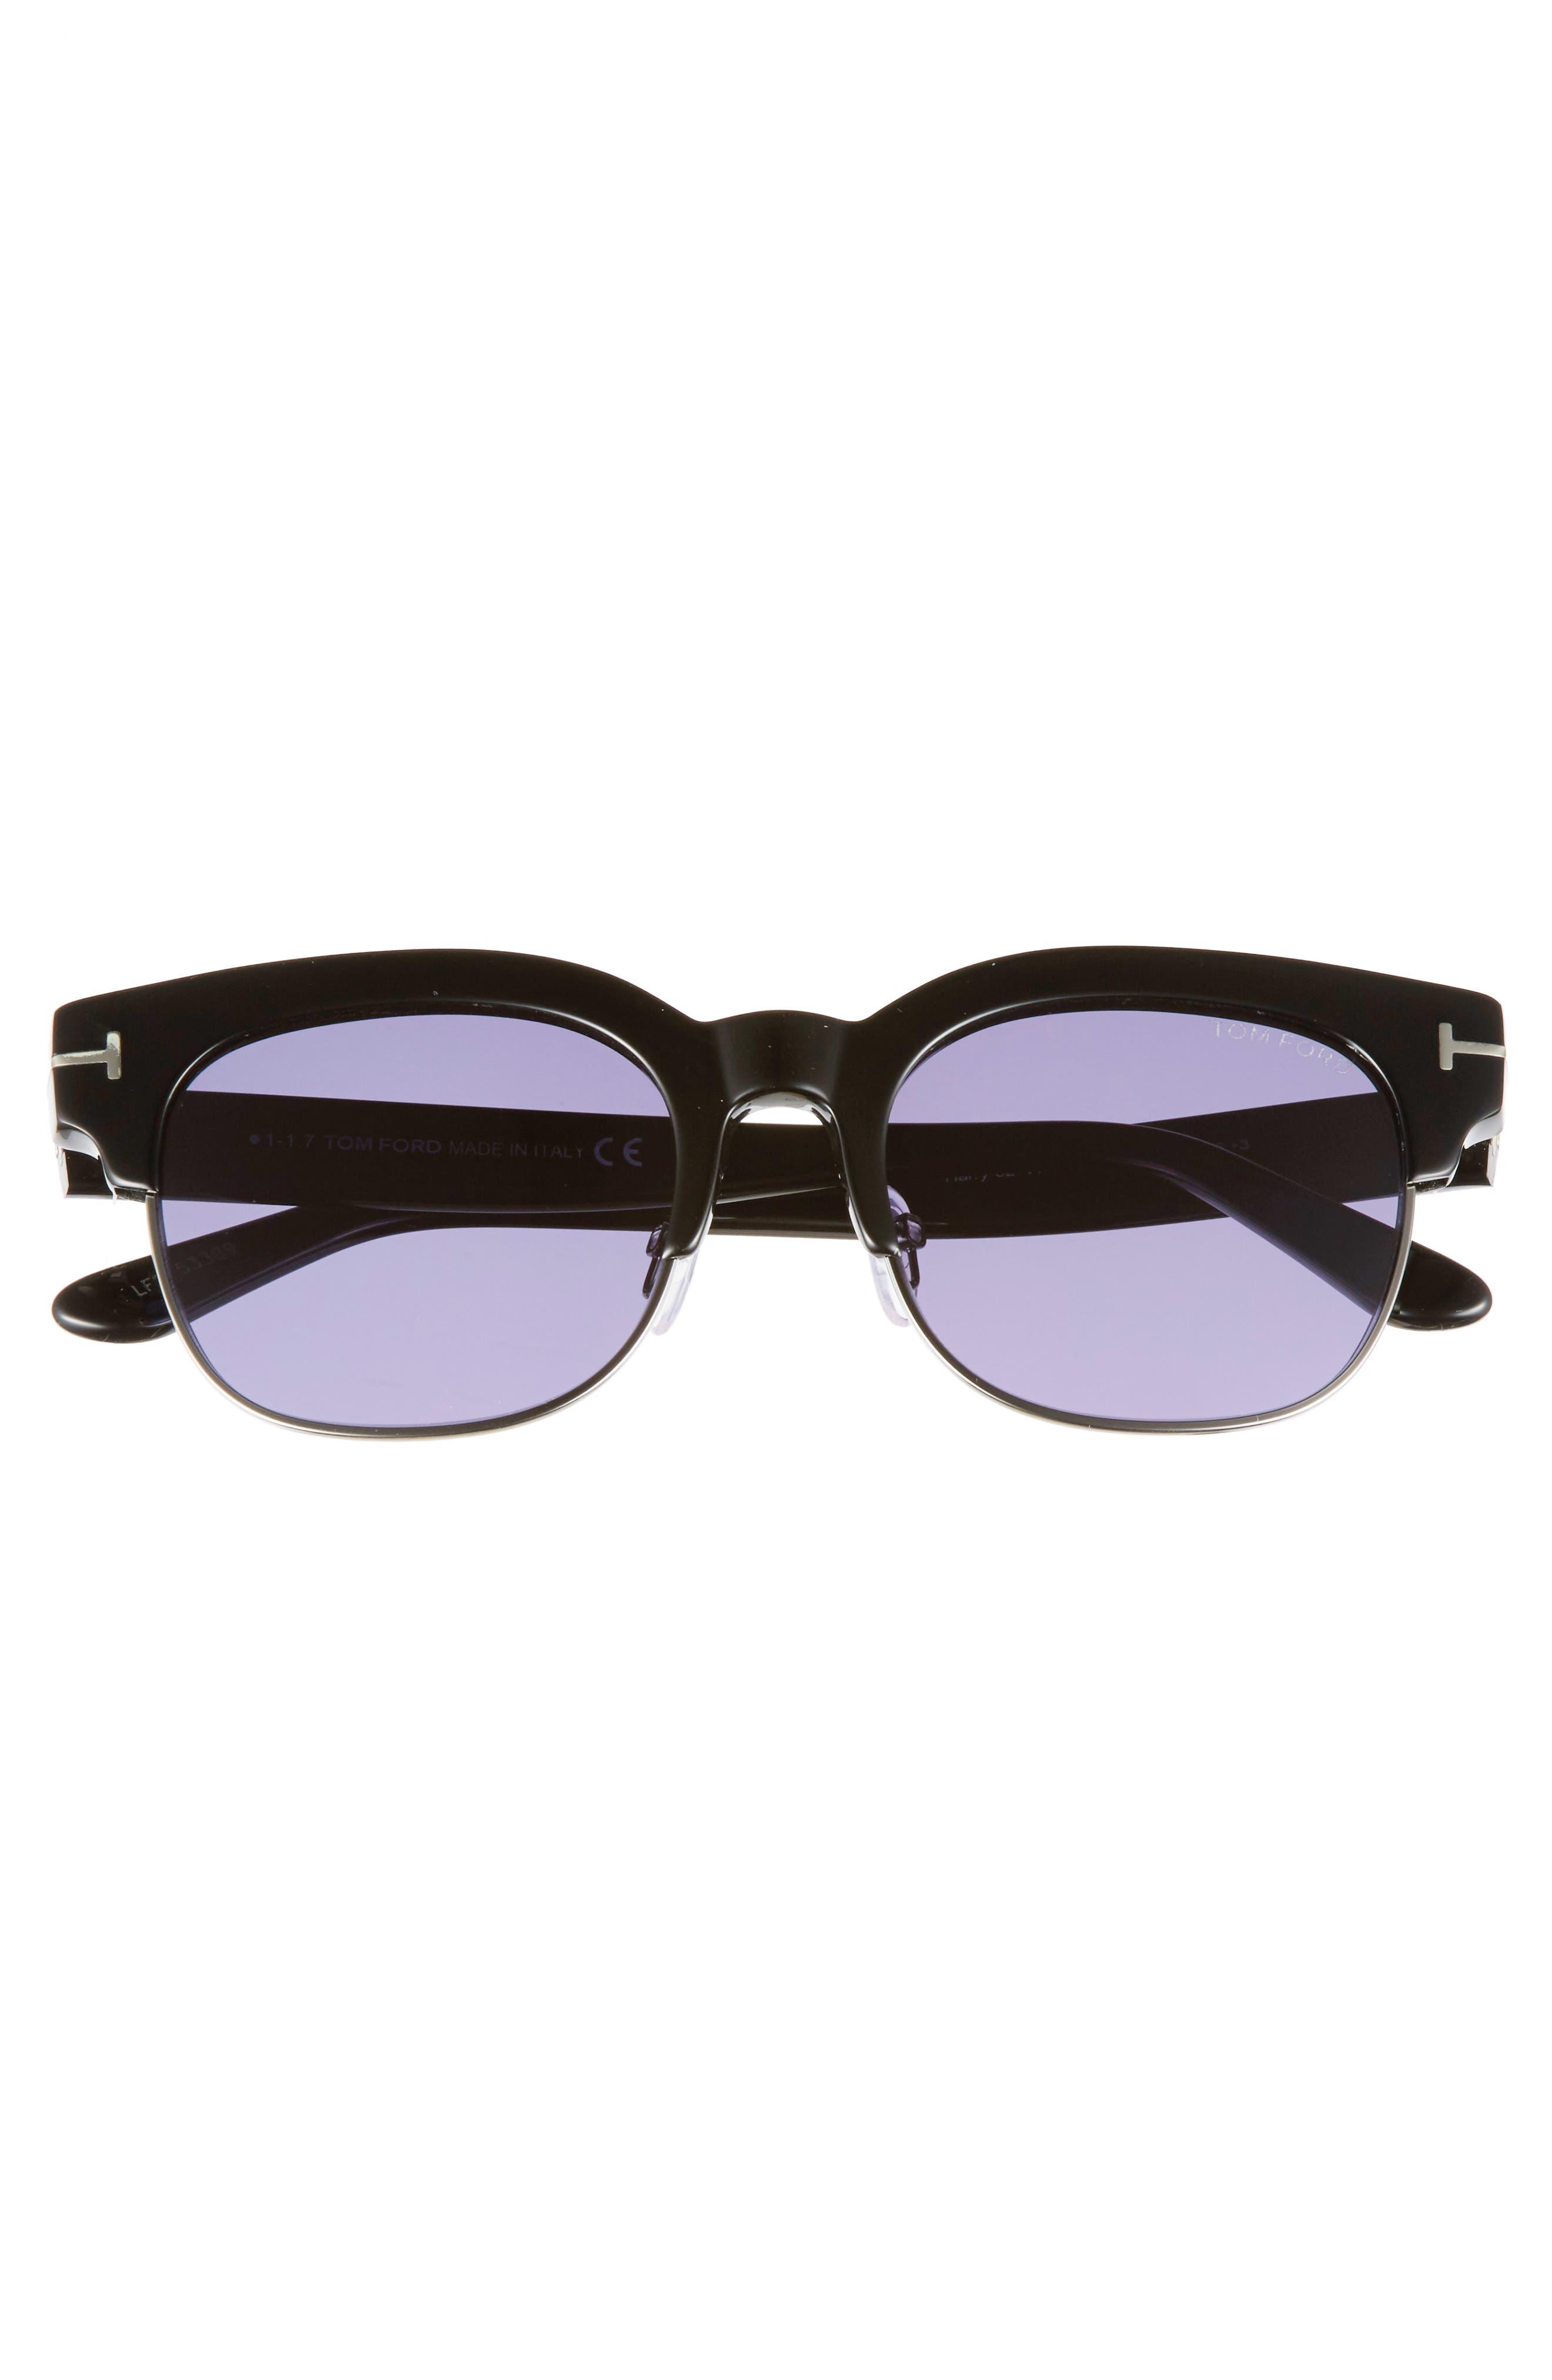 Harry 53mm Half-Rim Sunglasses,                             Alternate thumbnail 3, color,                             BLACK/ DARK RUTHENIUM/ BLUE